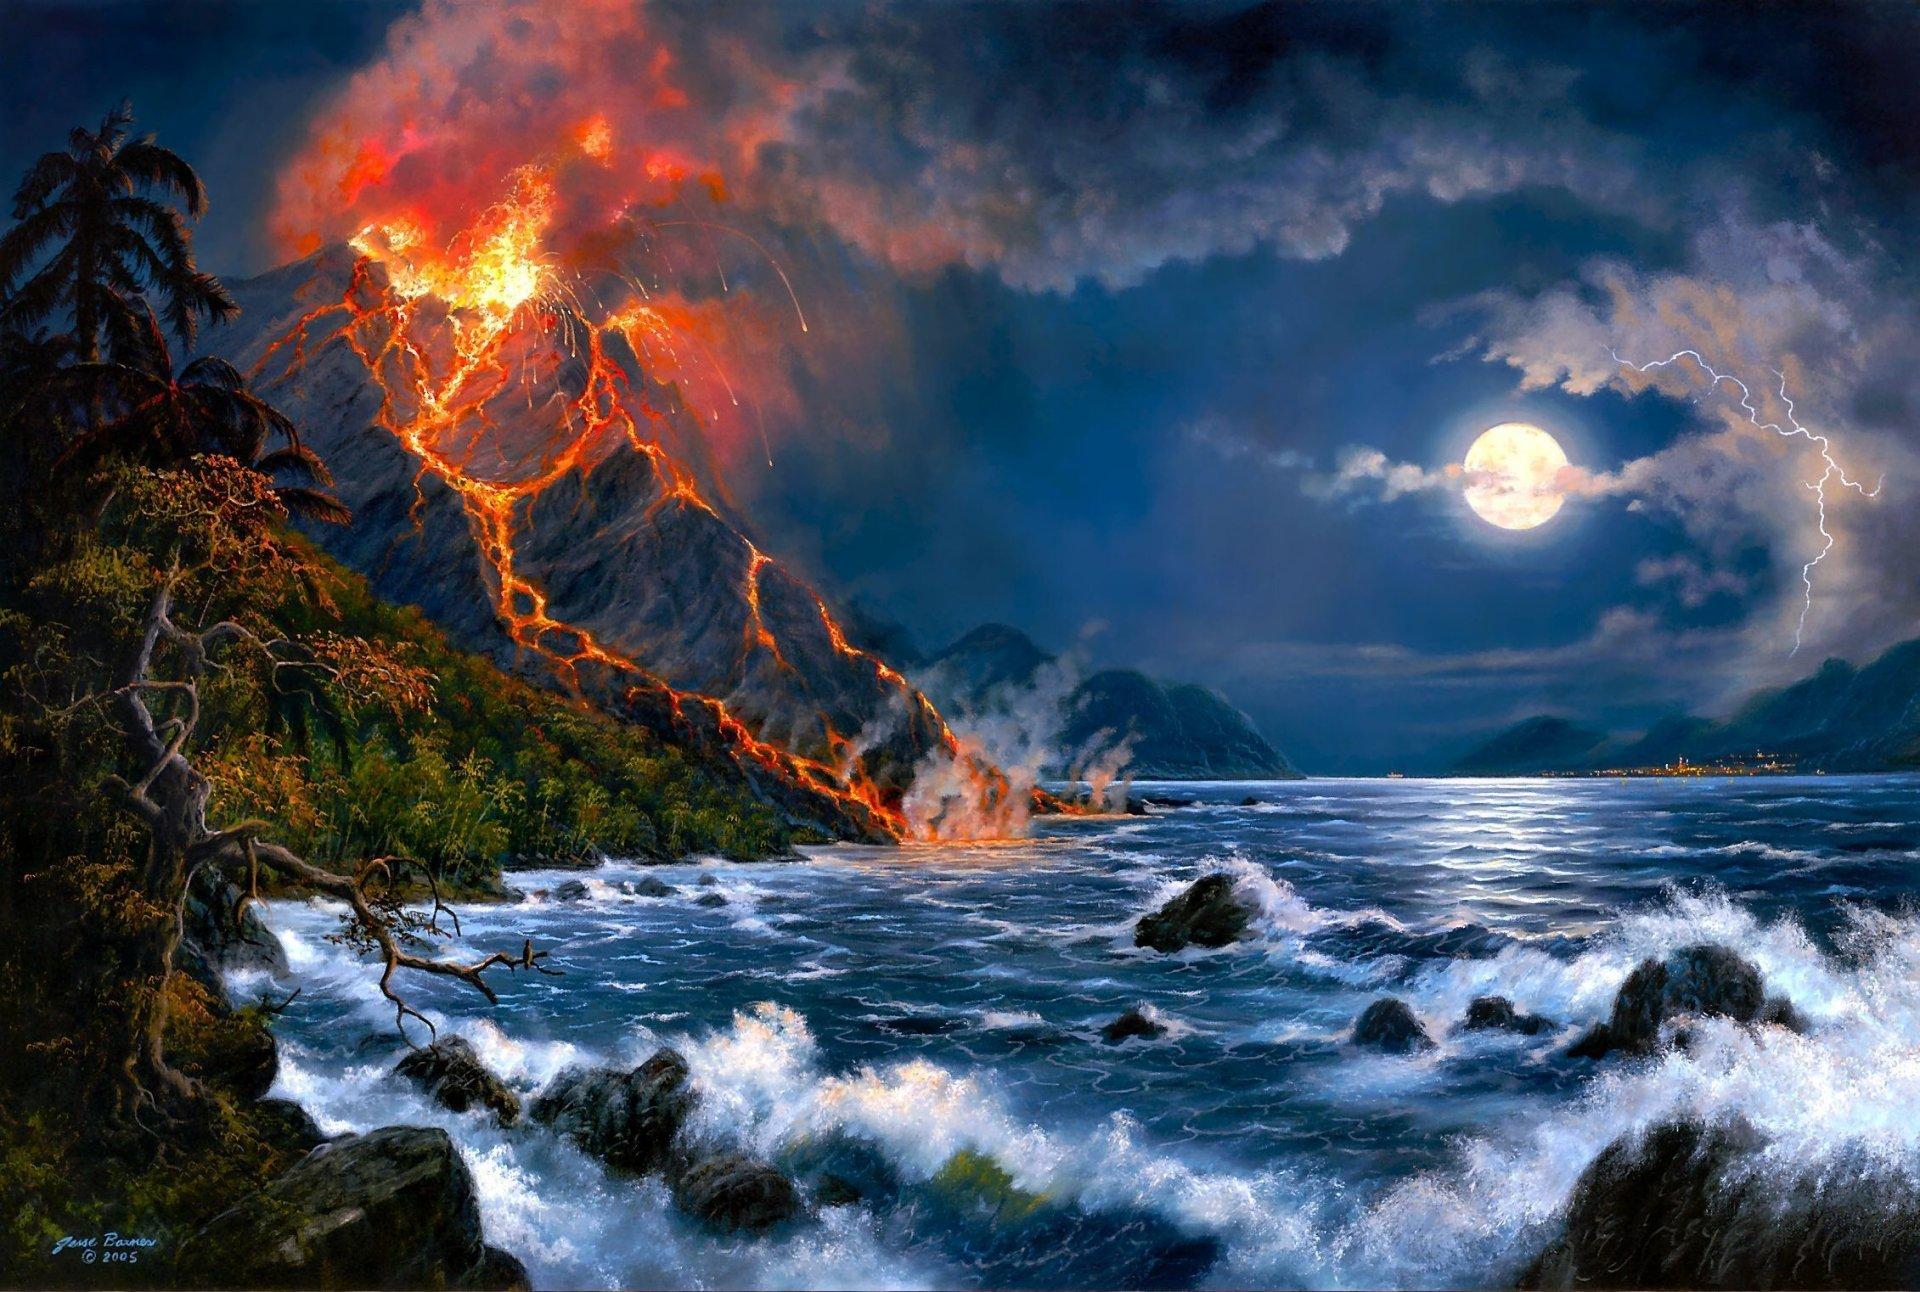 Artistic - Artistic  Volcano Eruption Ocean Rock Wave Moon Sky Lightning Cloud Night Wallpaper